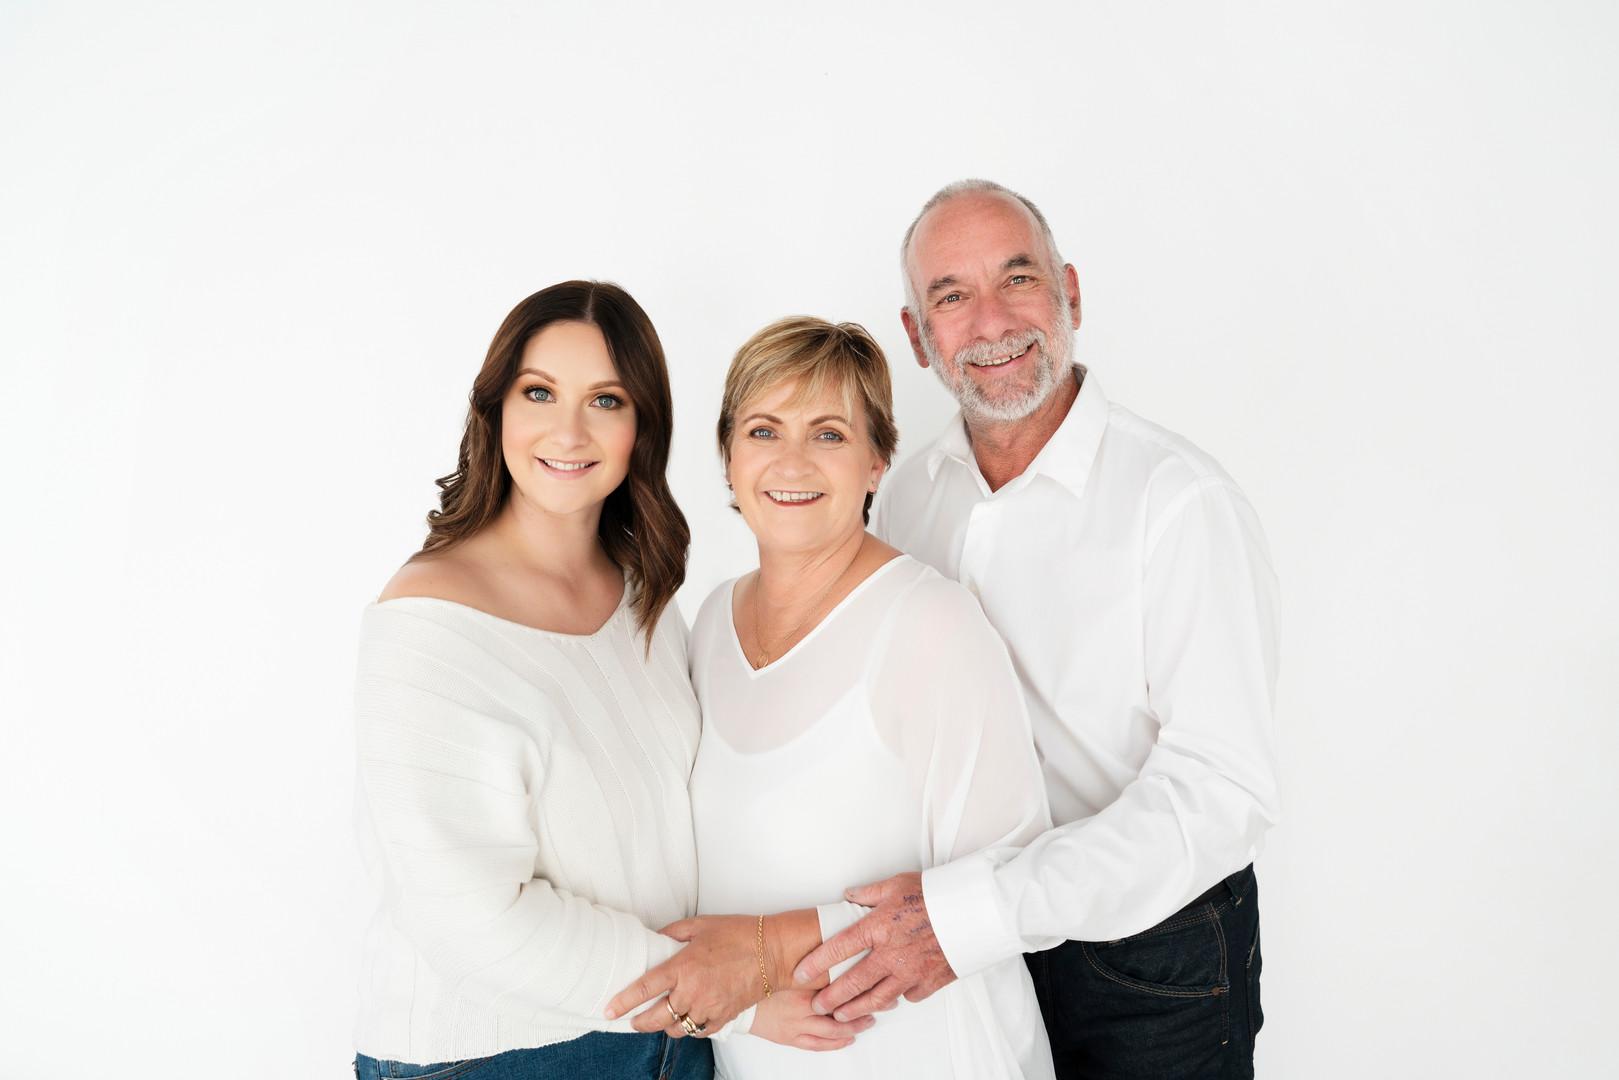 Hamilton Family Photographer